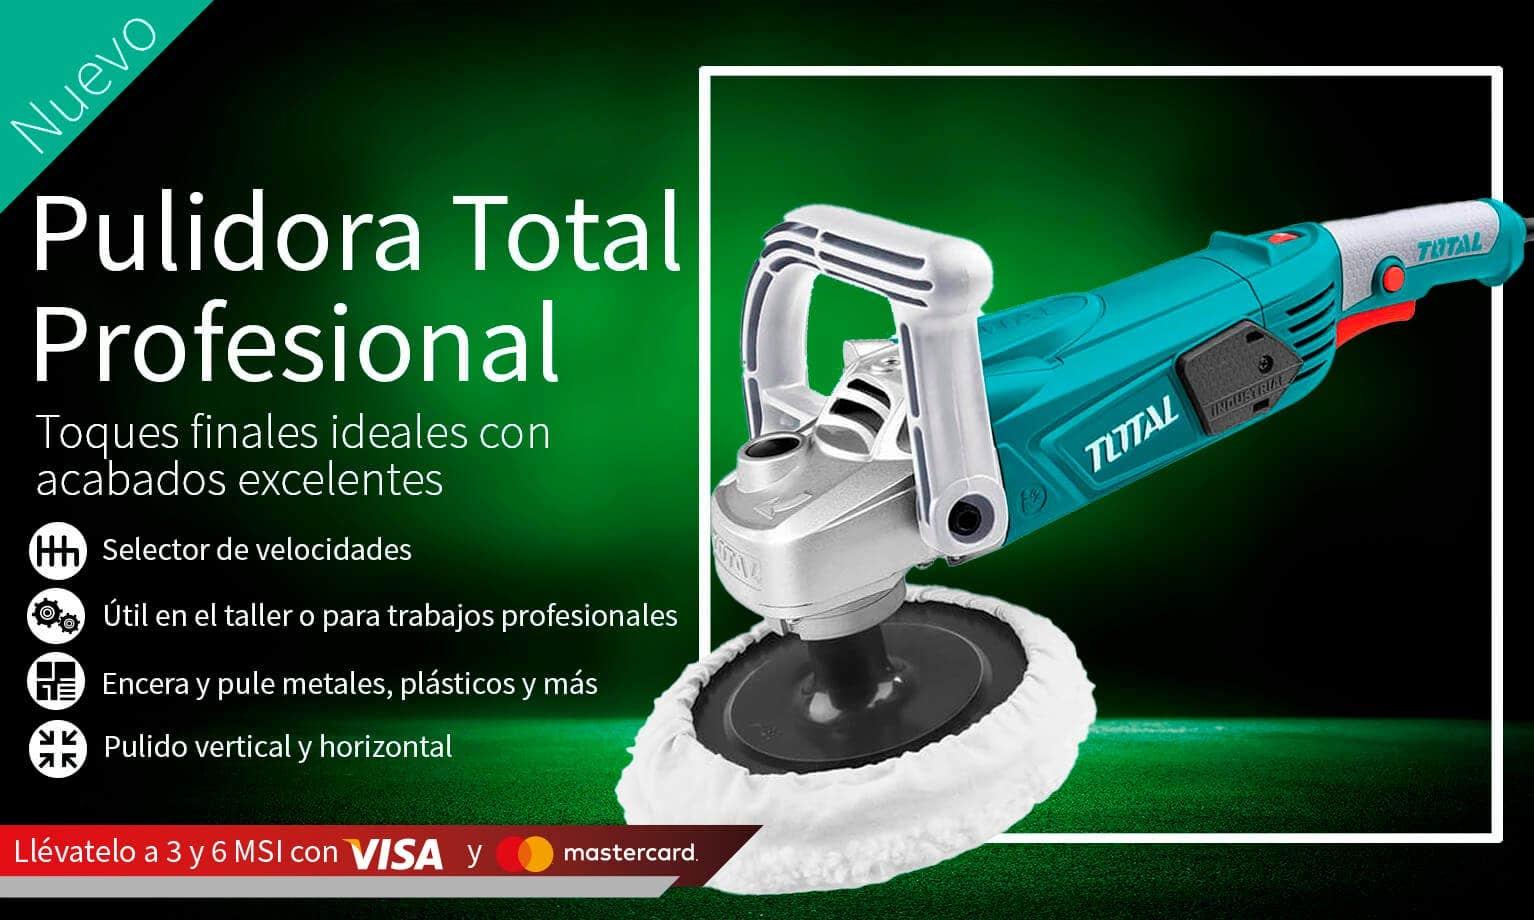 Pulidora Total Profesional con 3 y 6 MSI